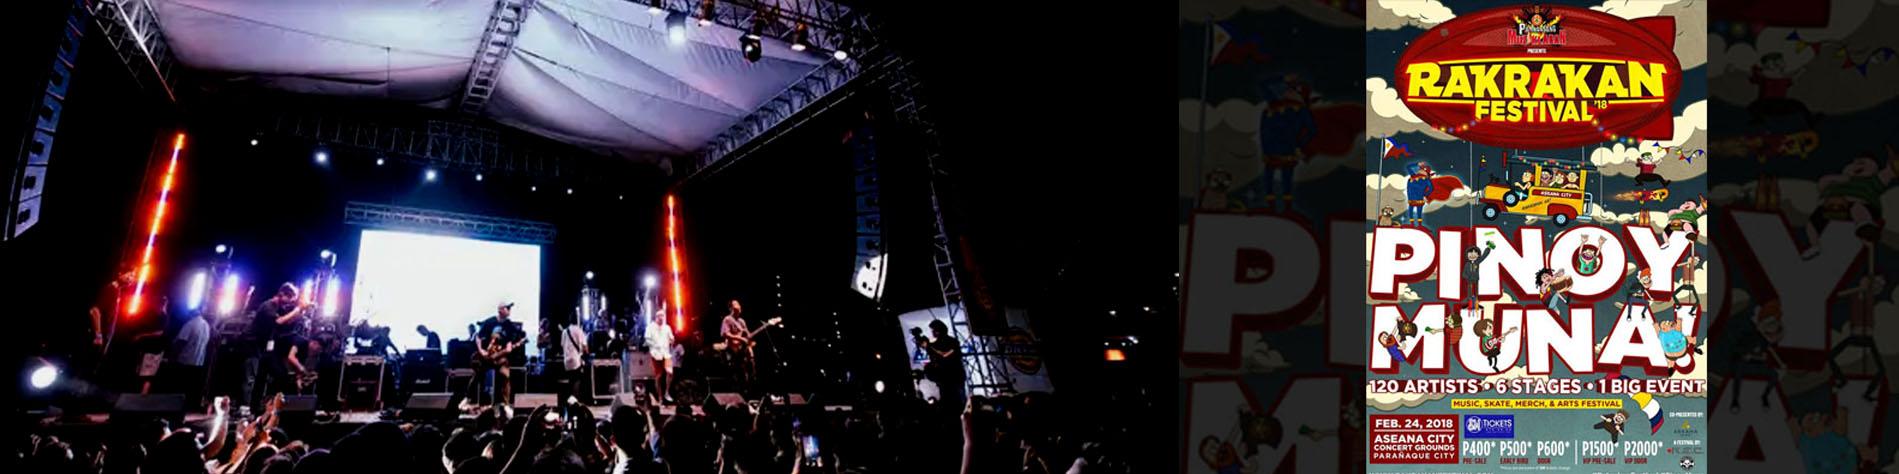 Rakrakan Festival 2018 Pinoy Muna!